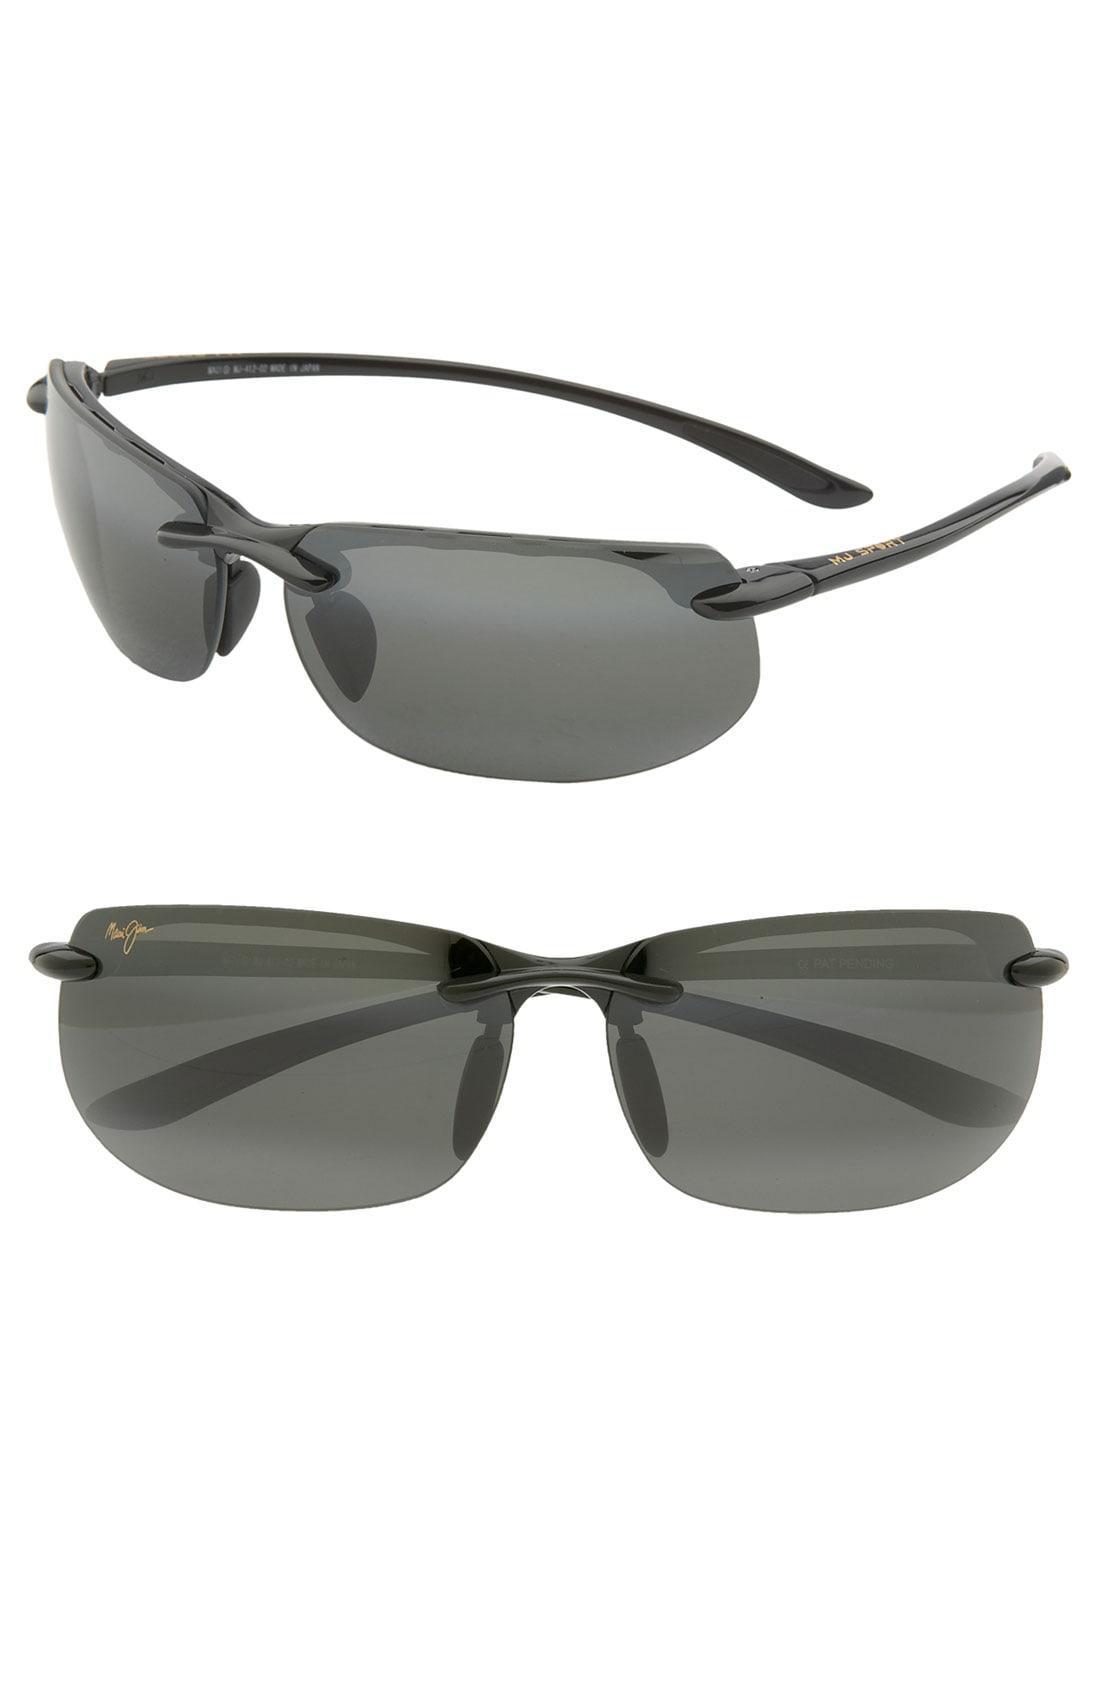 783fb0daebd Lyst - Maui Jim 'banyans - Polarizedplus2' 67mm Sunglasses - Gloss ...